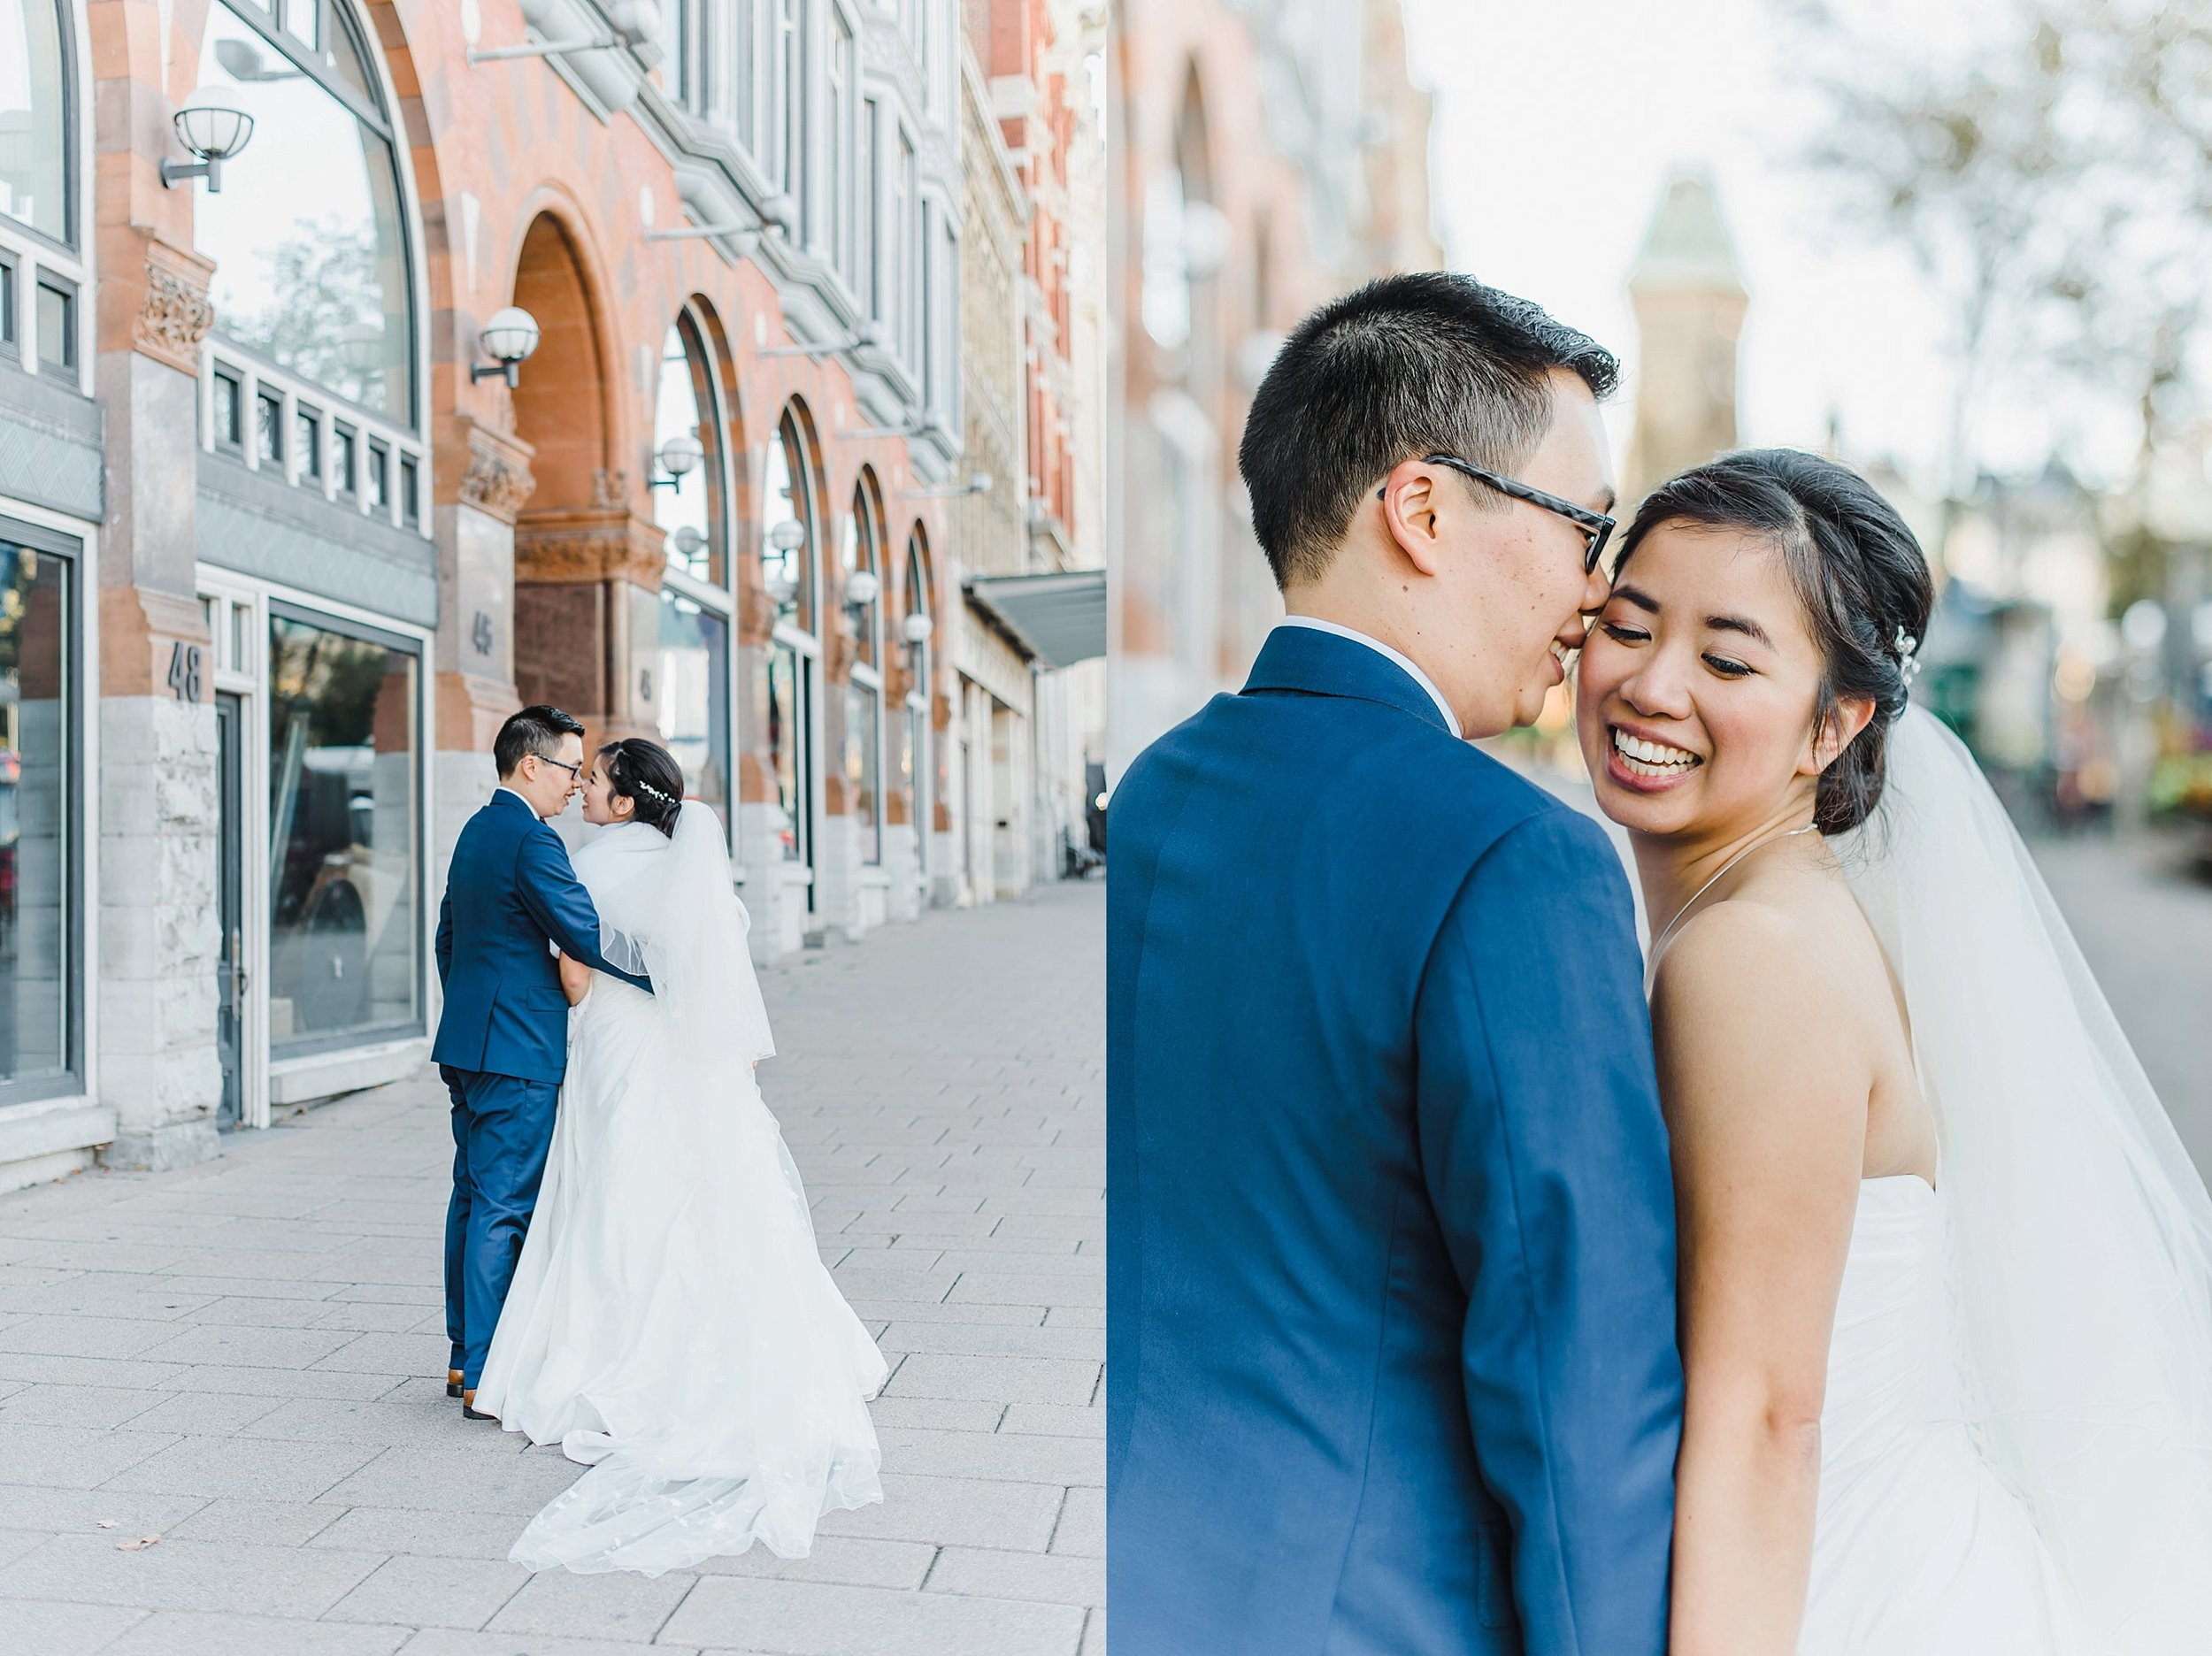 light airy indie fine art ottawa wedding photographer | Ali and Batoul Photography_1534.jpg